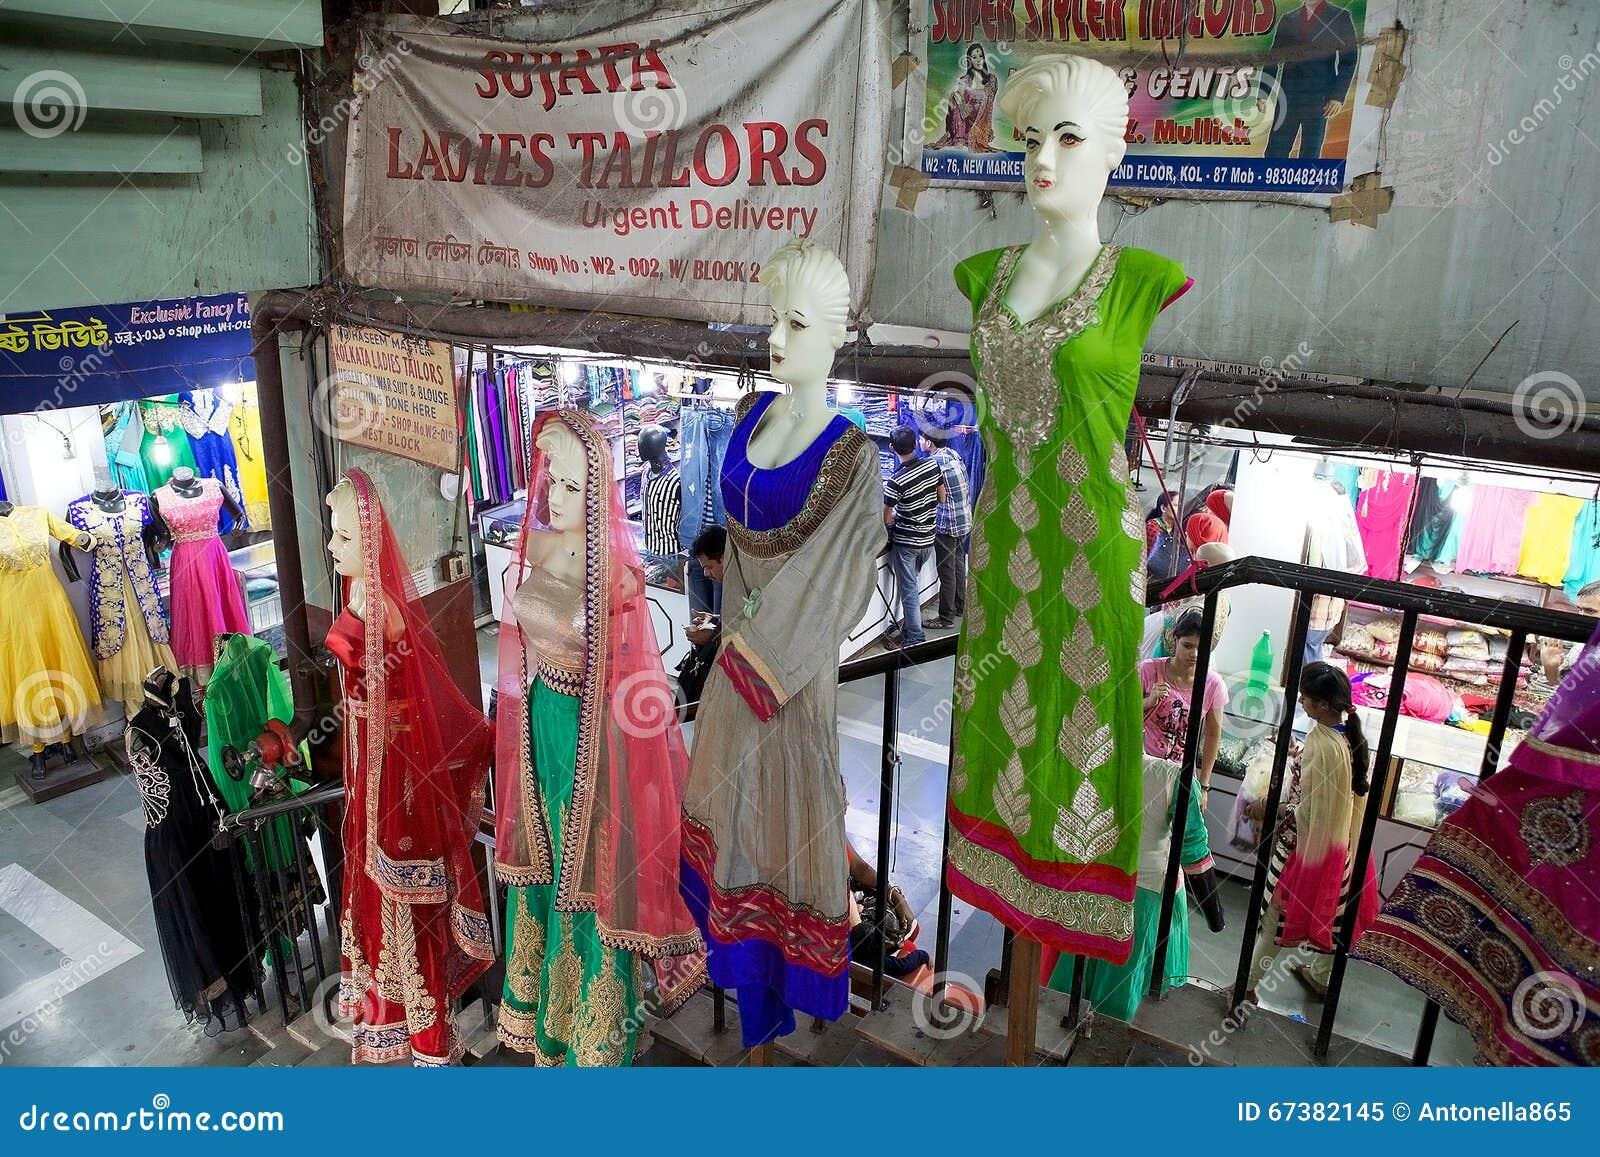 fa97032480 Indian Clothes For Sale At The New Market, Kolkata, India Editorial ...